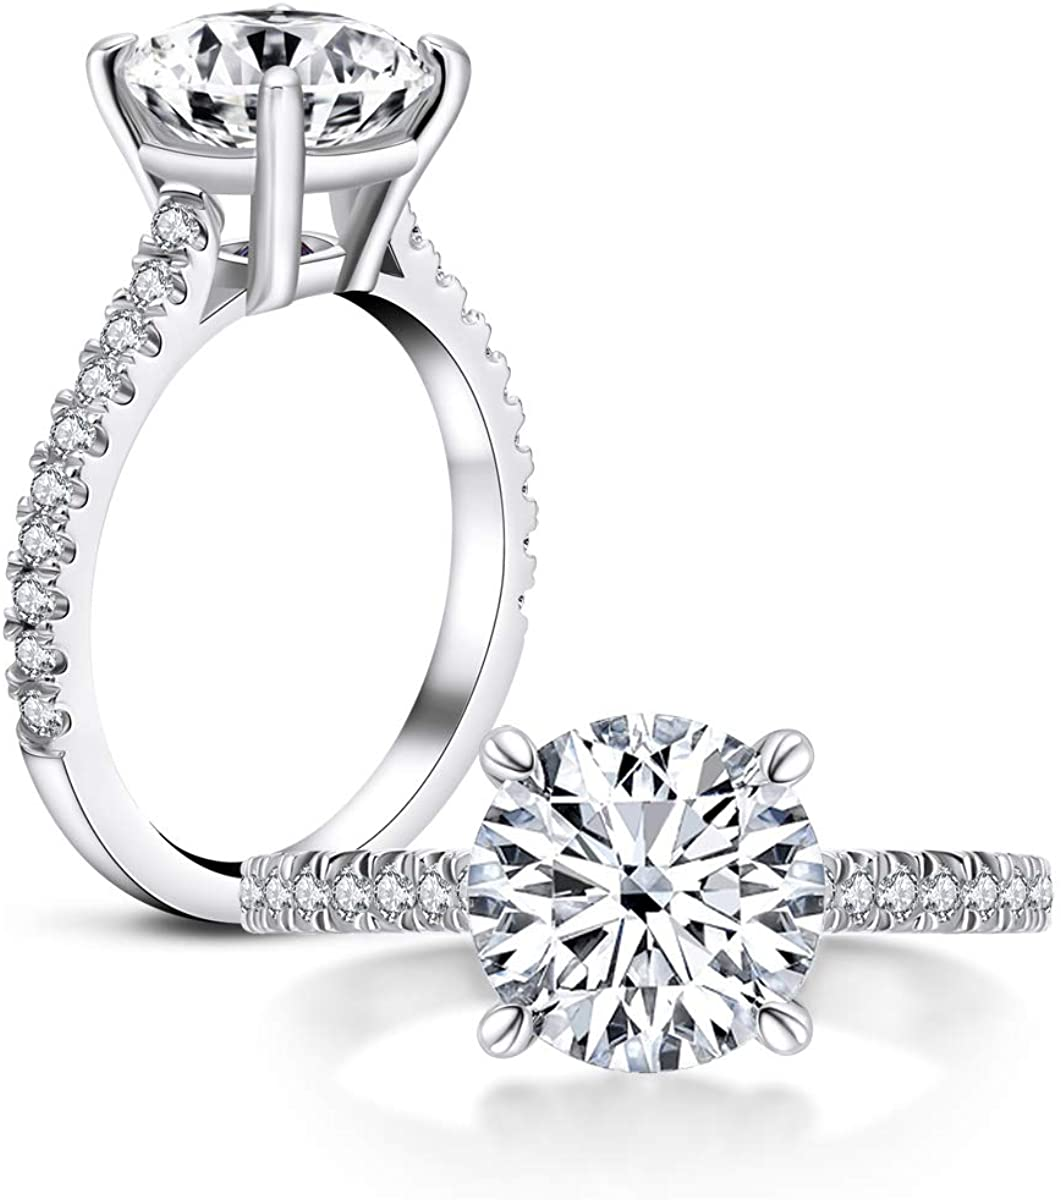 Erllo 3 Carat Round Cut Cubic Zirconia 925 Sterling Silver Women Wedding Engagement Rings (6.5)